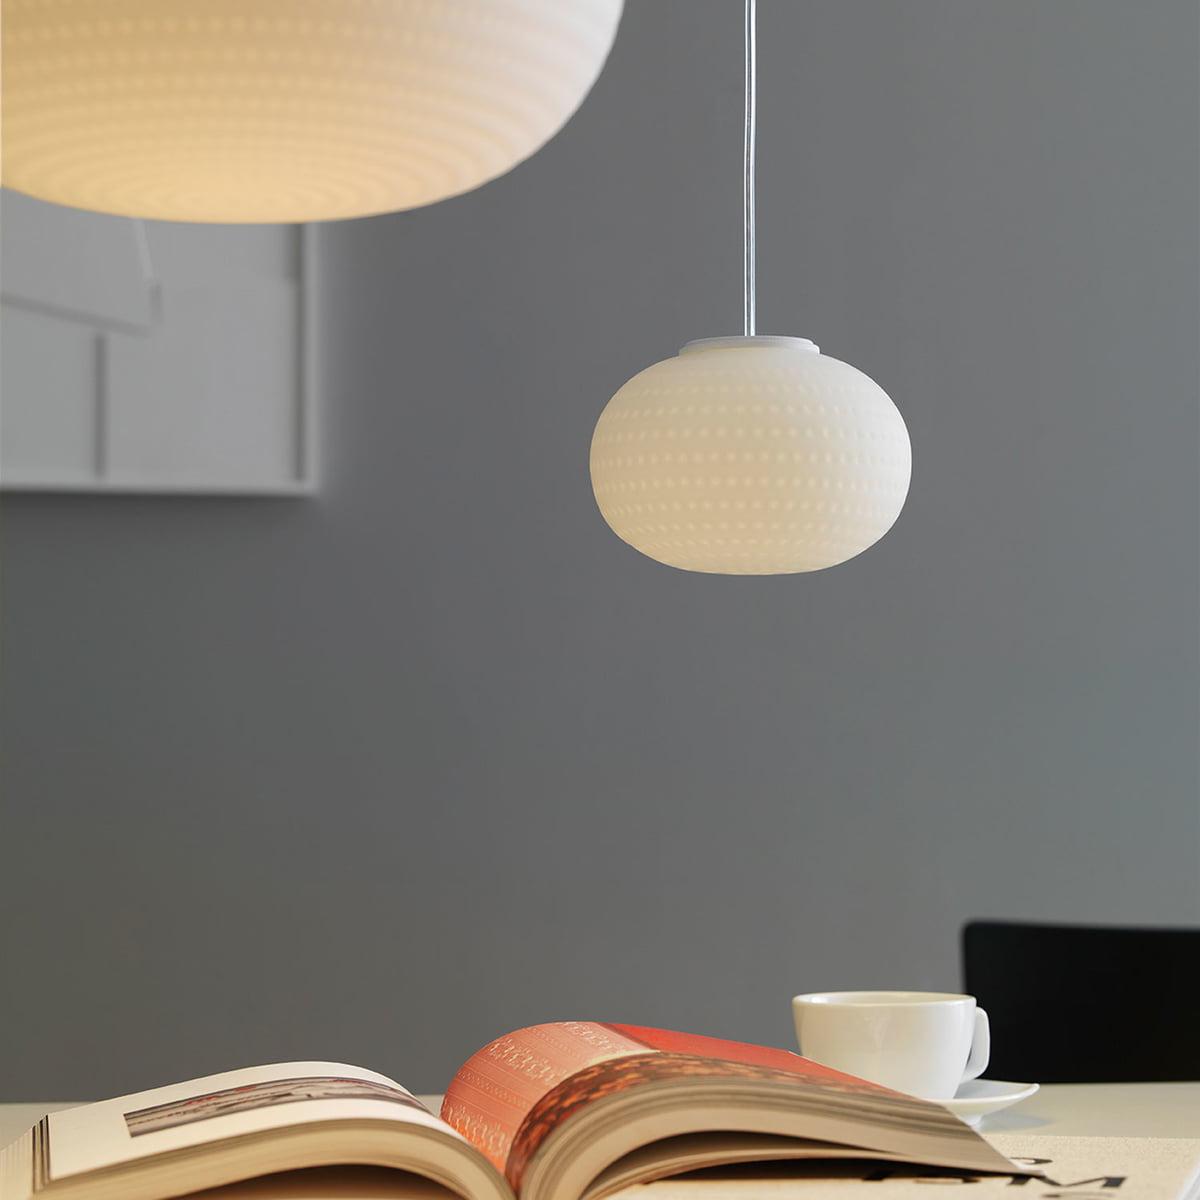 bianca pendelleuchte von fontanaarte im shop. Black Bedroom Furniture Sets. Home Design Ideas